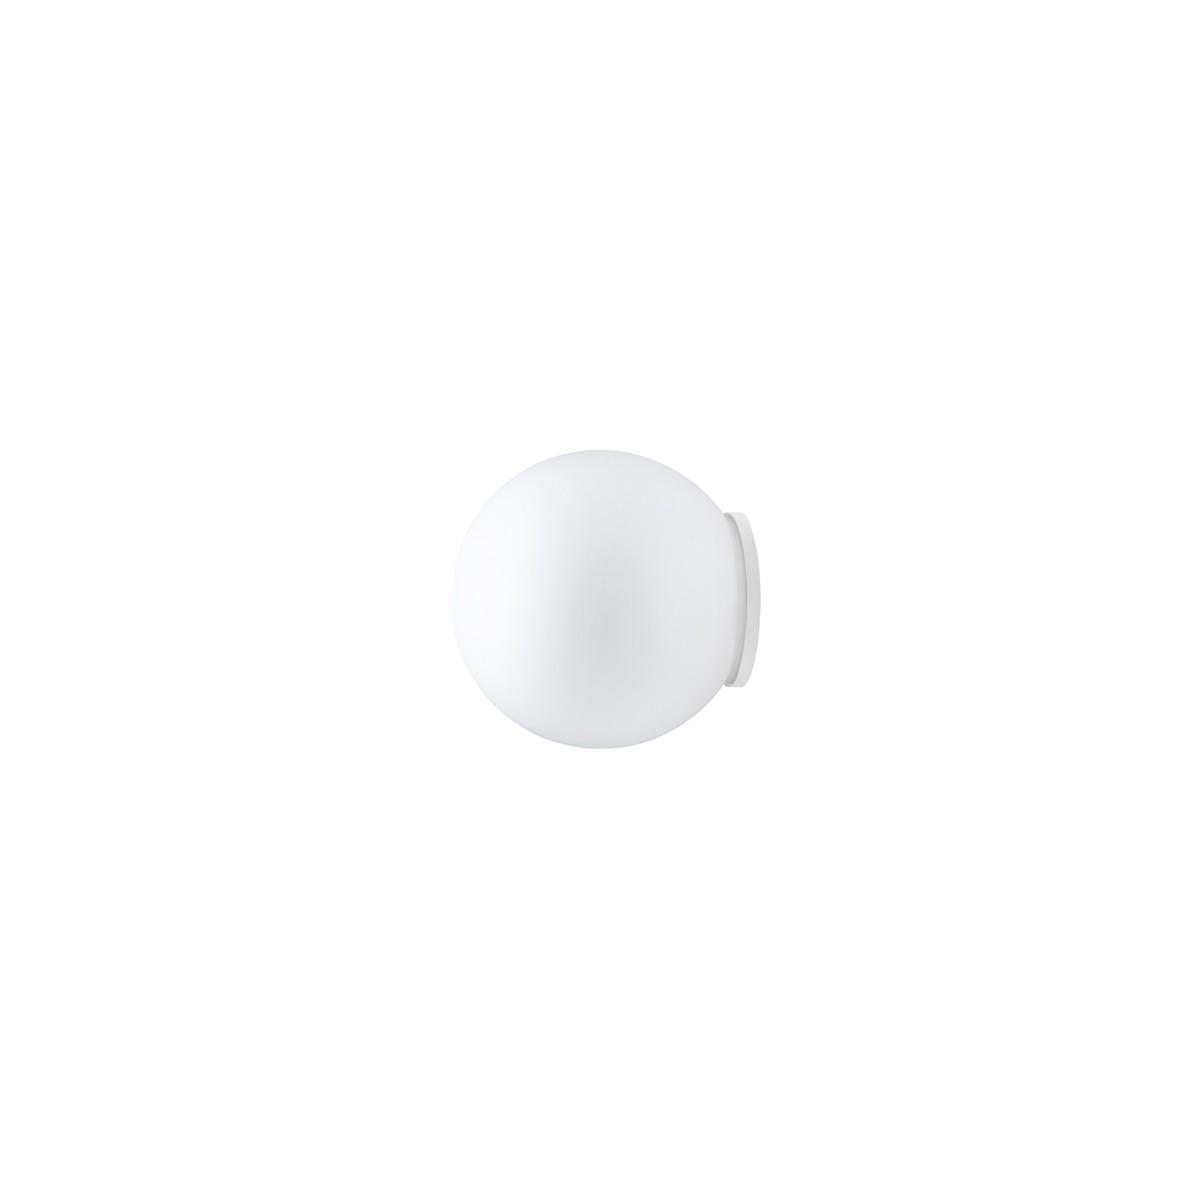 Fabbian Lumi Sfera Wand-/Deckenleuchte, Ø: 9 cm